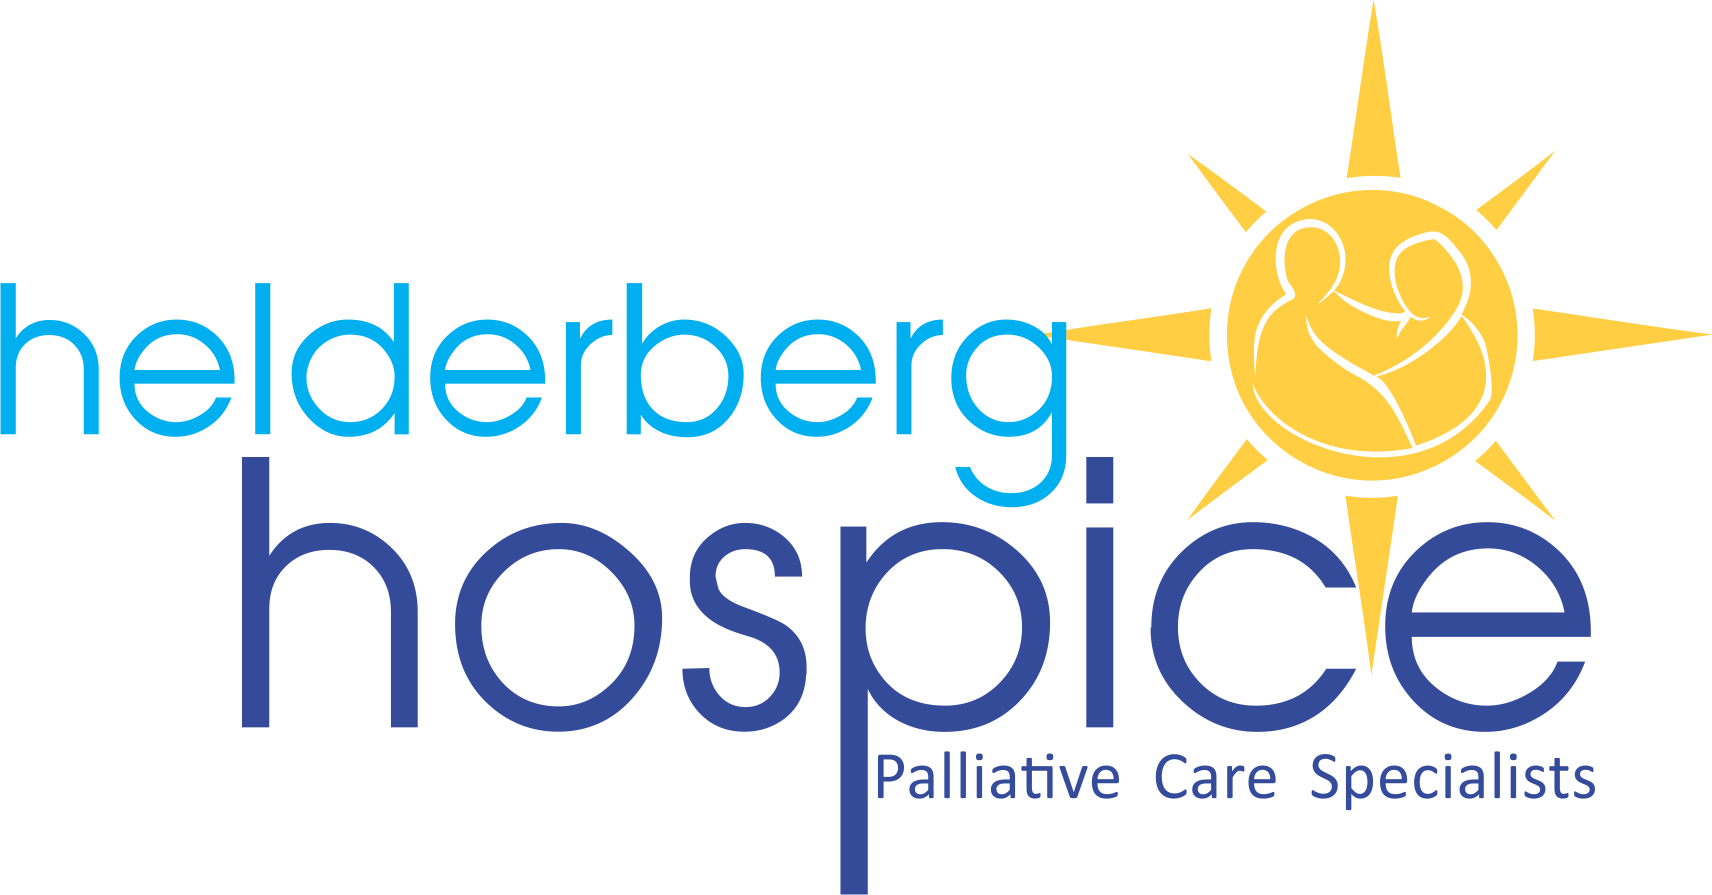 Helderberg_Hospice_logo_for_on_computer_use__2019-07_(1)